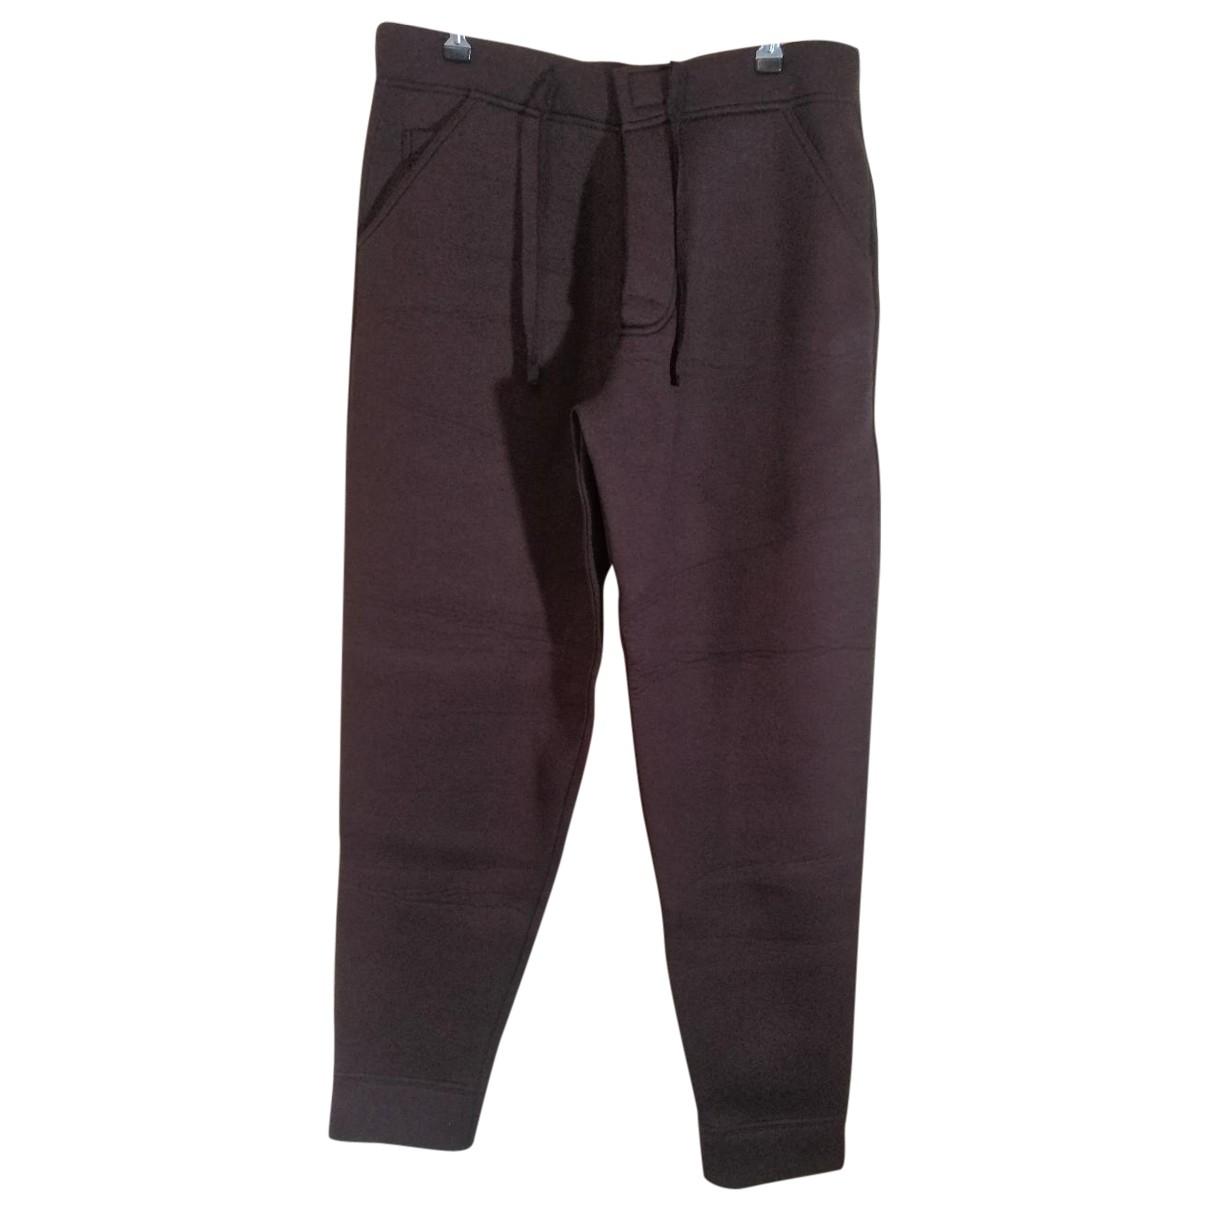 Kenzo \N Burgundy Trousers for Men M International